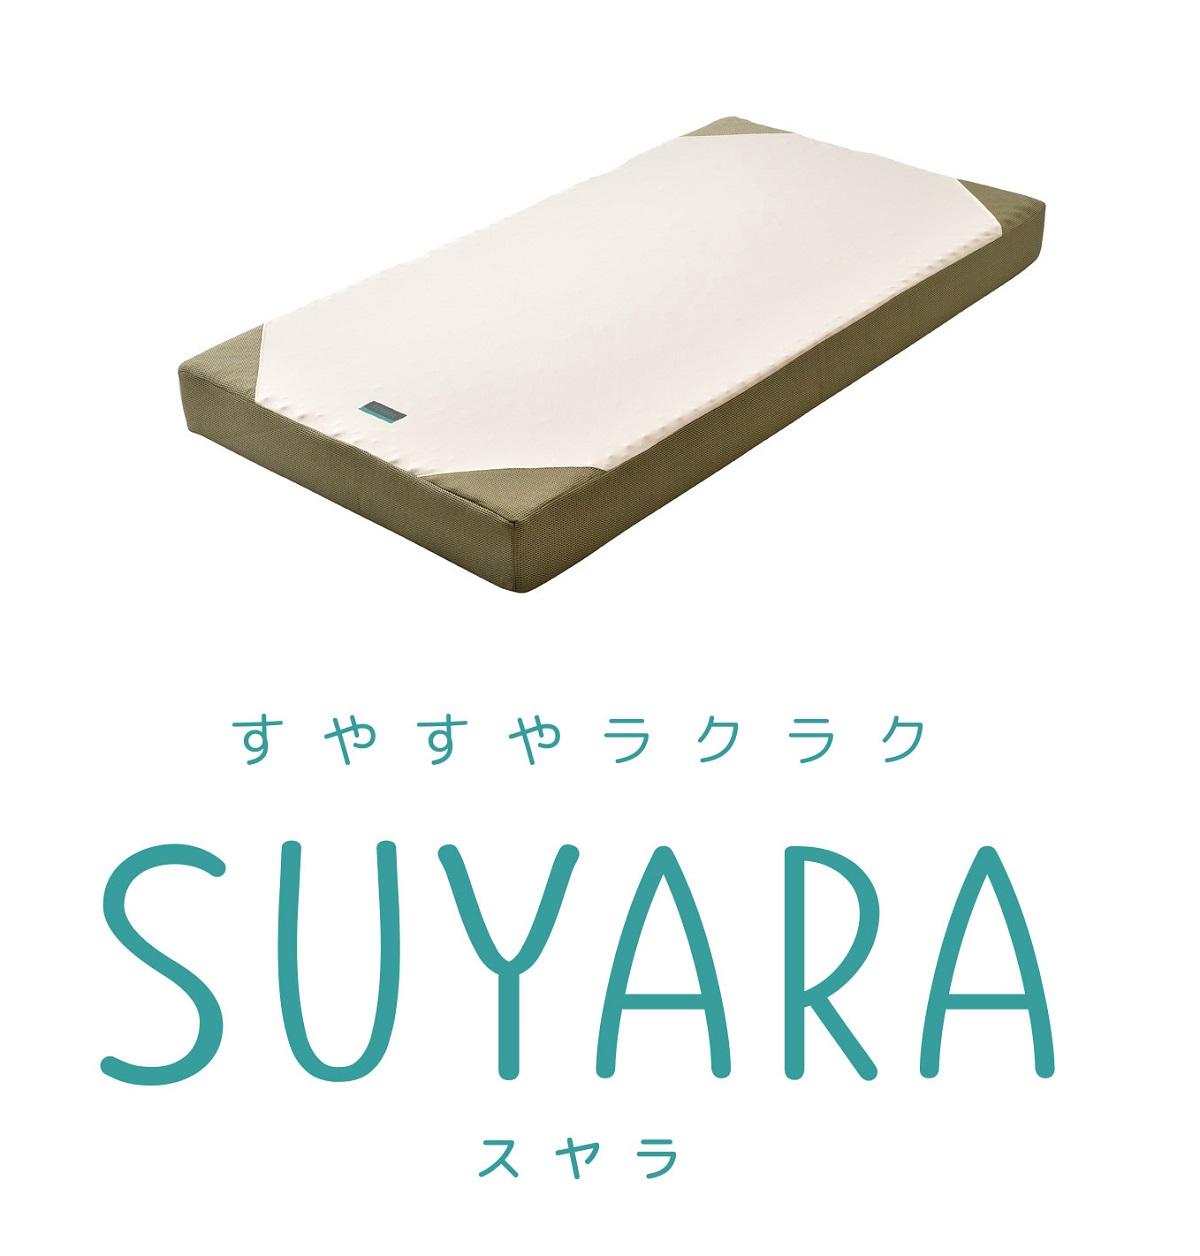 Seasonal Wrap入荷 ☆正規品新品未使用品 ベッドで使えるボリュームタイプ 西川 スヤラ SUYARA ベッドマットレス 220N 246010672 120×195×16cm セミダブル SU-01